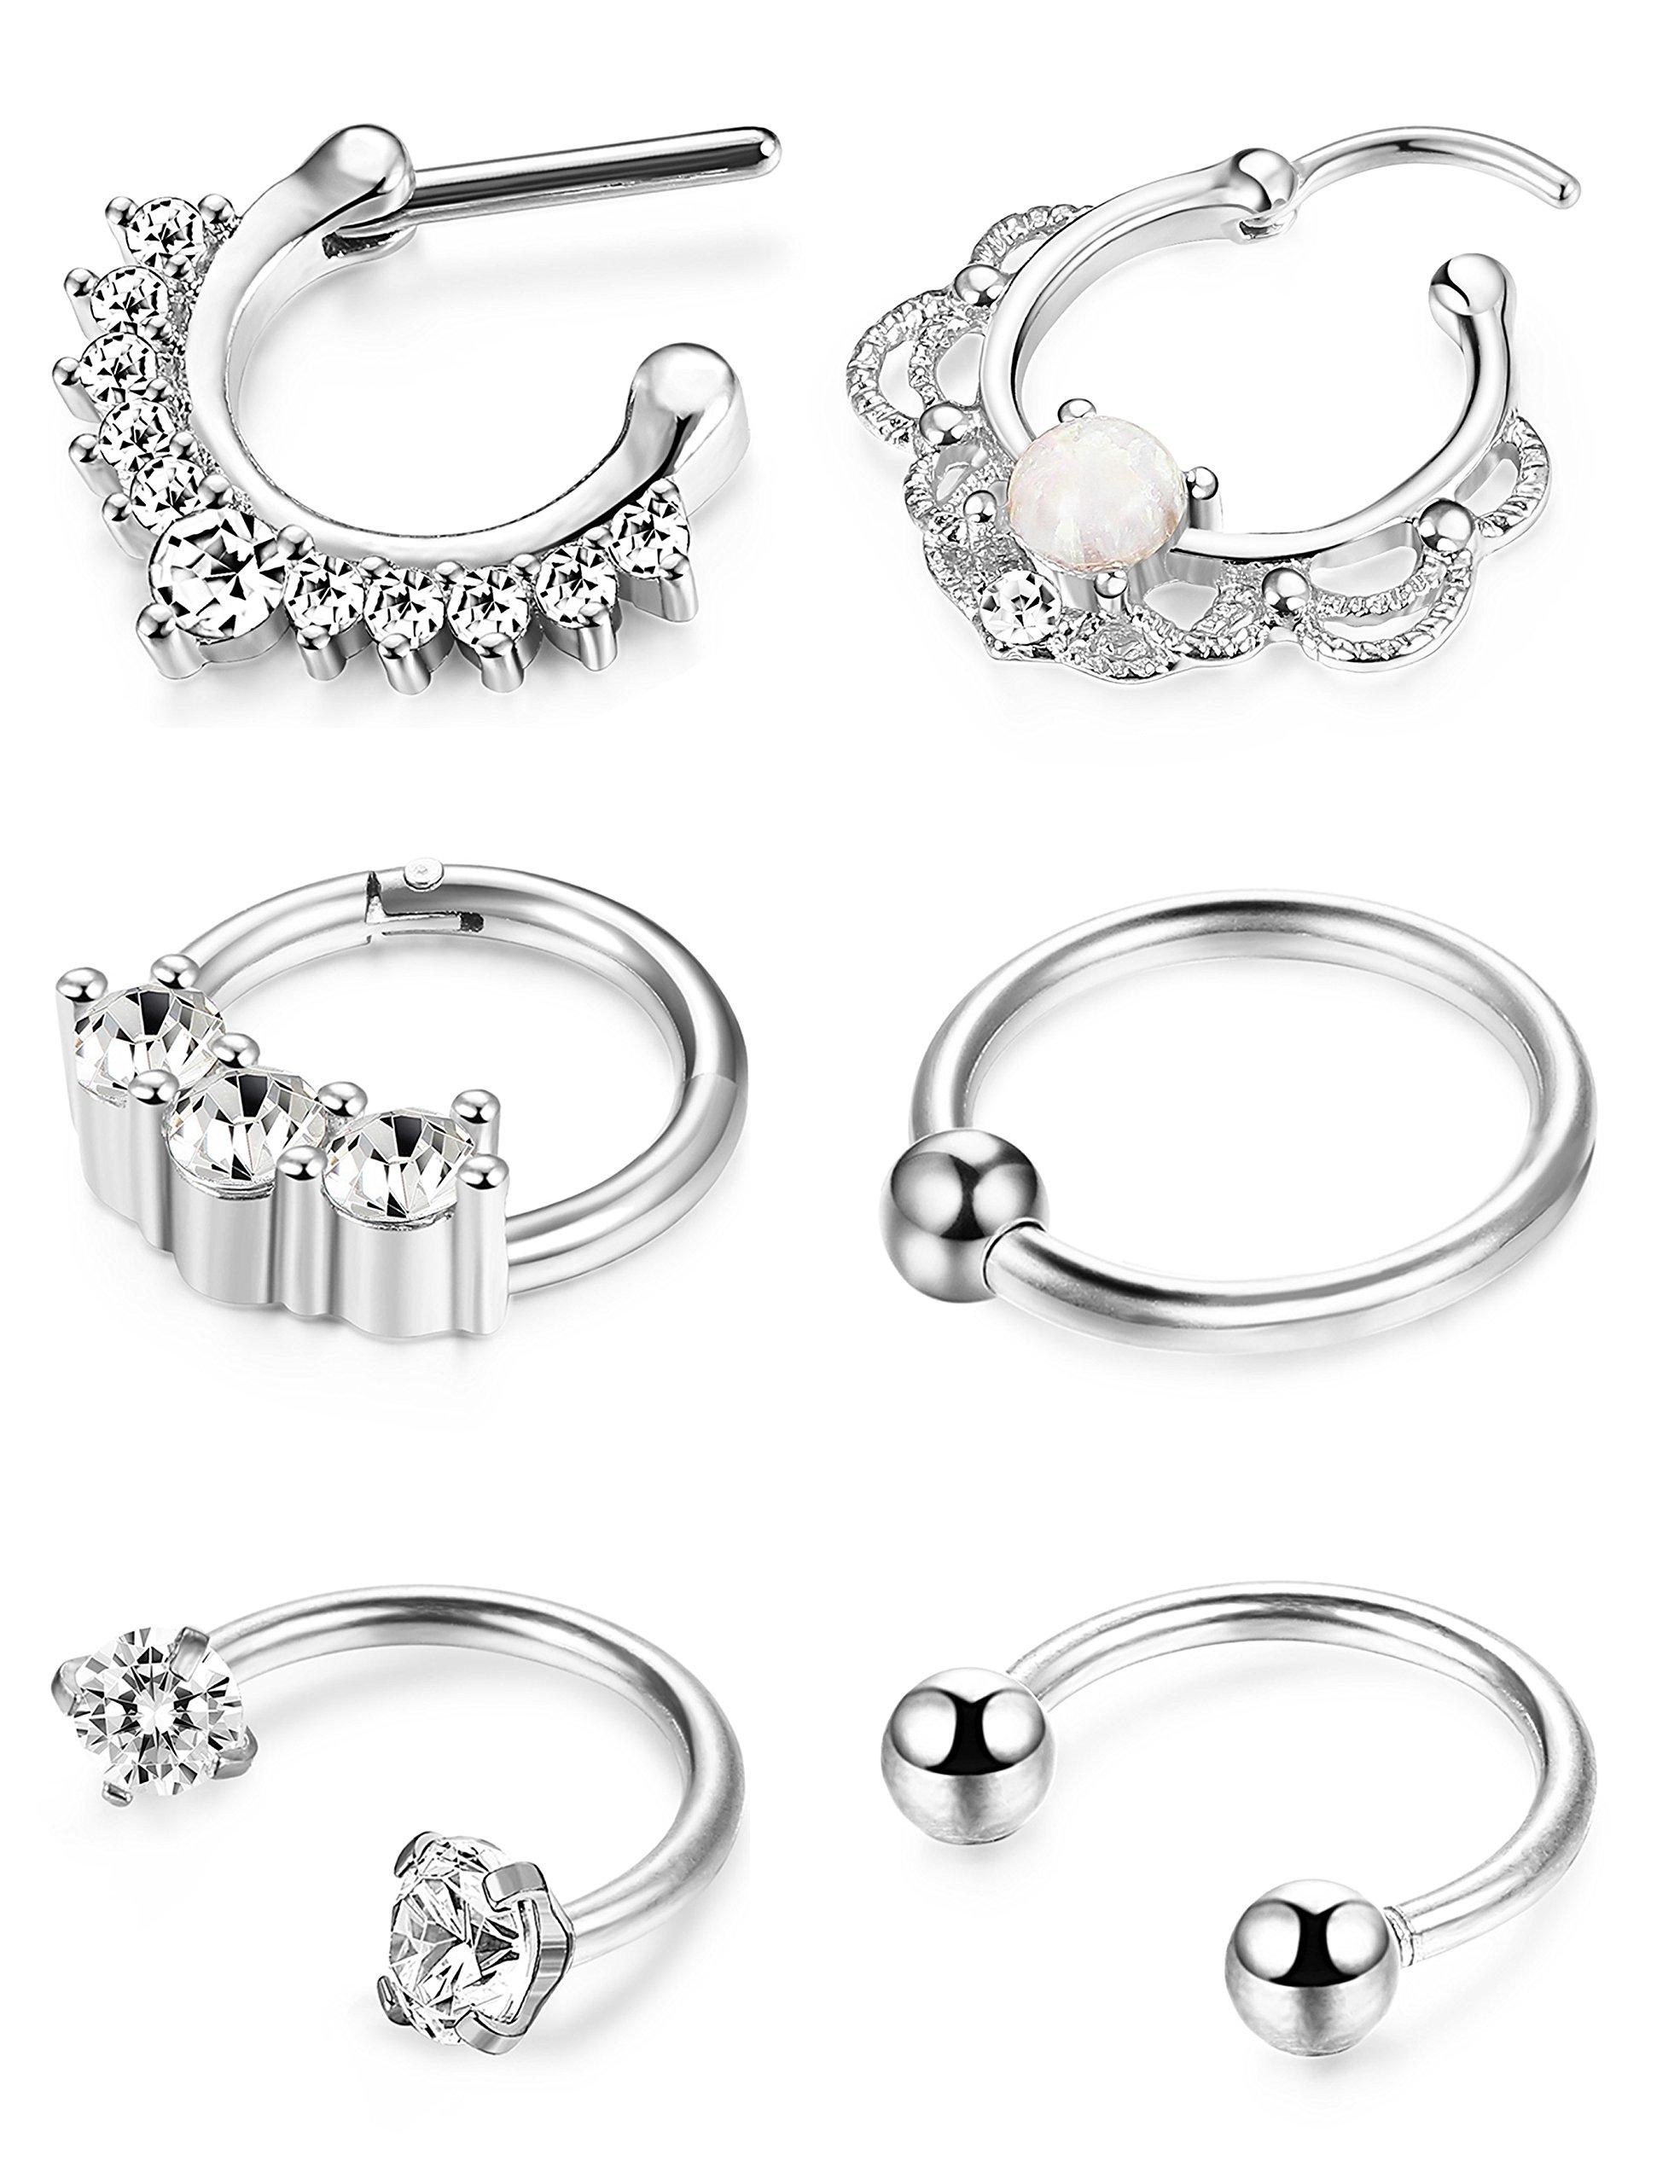 BodySparkle Body Jewelry Set of Two Black 20g-18g-16g-14g Captive Bead Rings-Daith Earrings-Steel CBR-Septum-Nipple-Lip Hoop